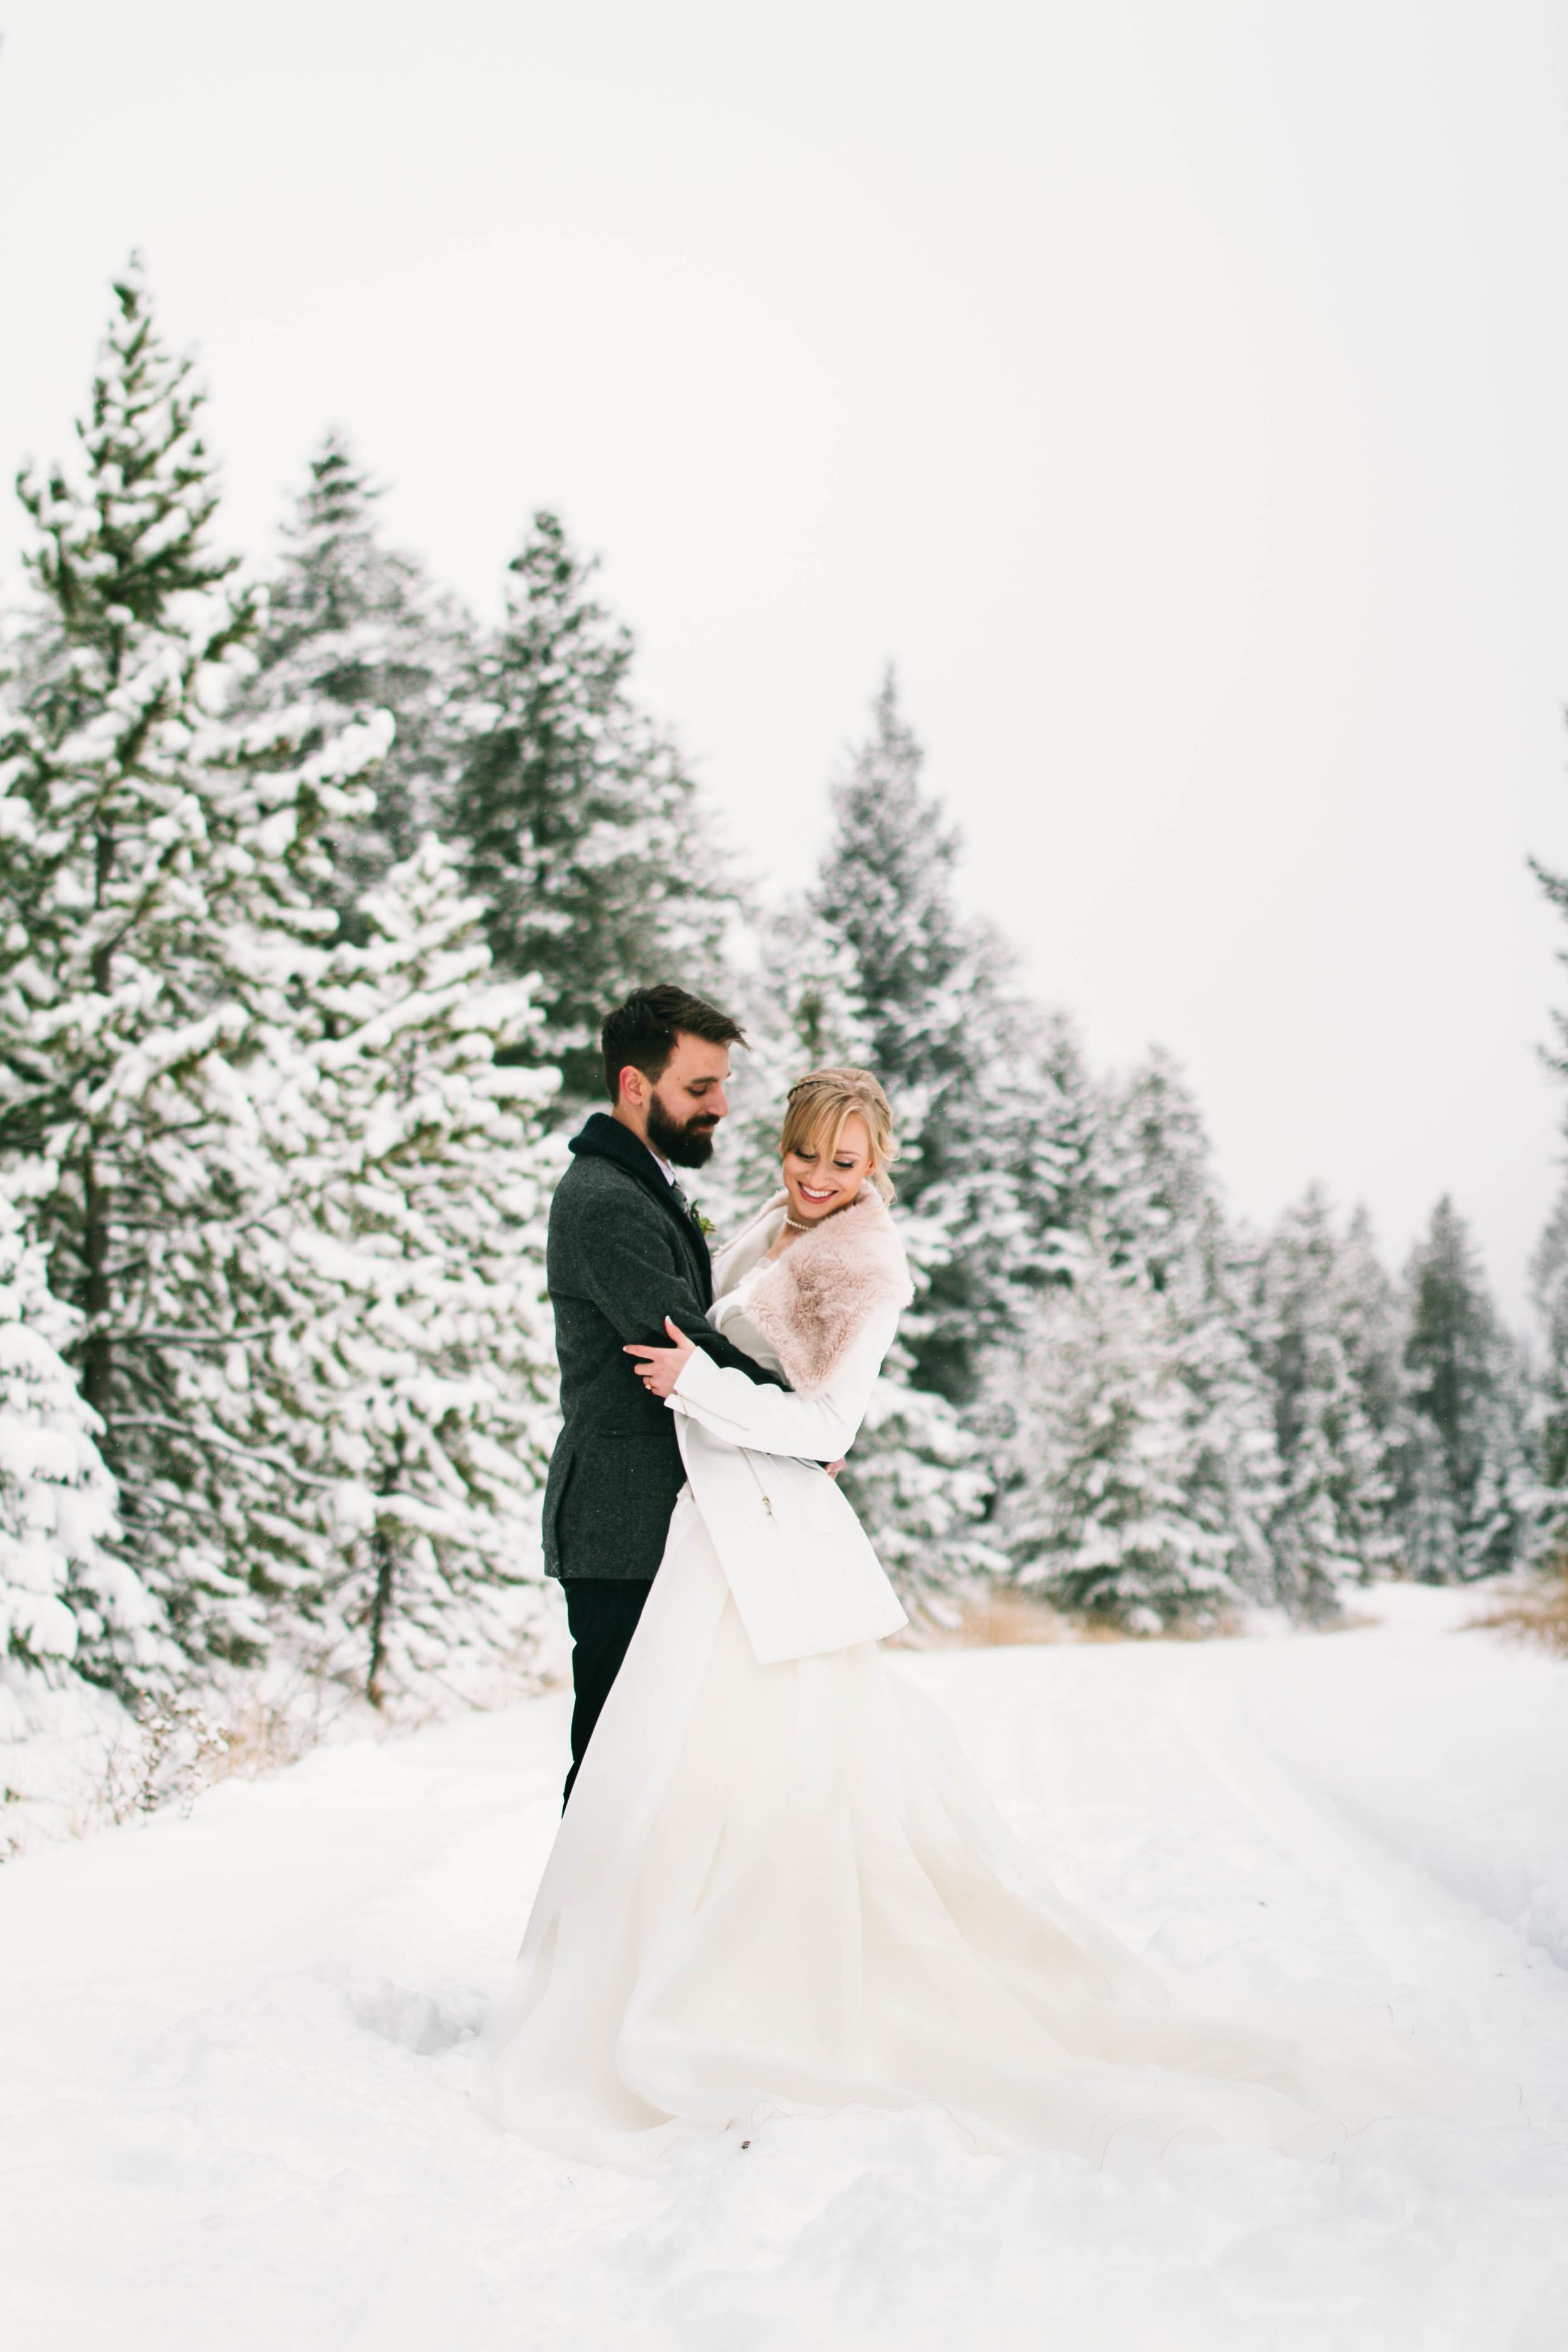 Bonin Wedding - Madeleine Bonin Photography-5793.jpg